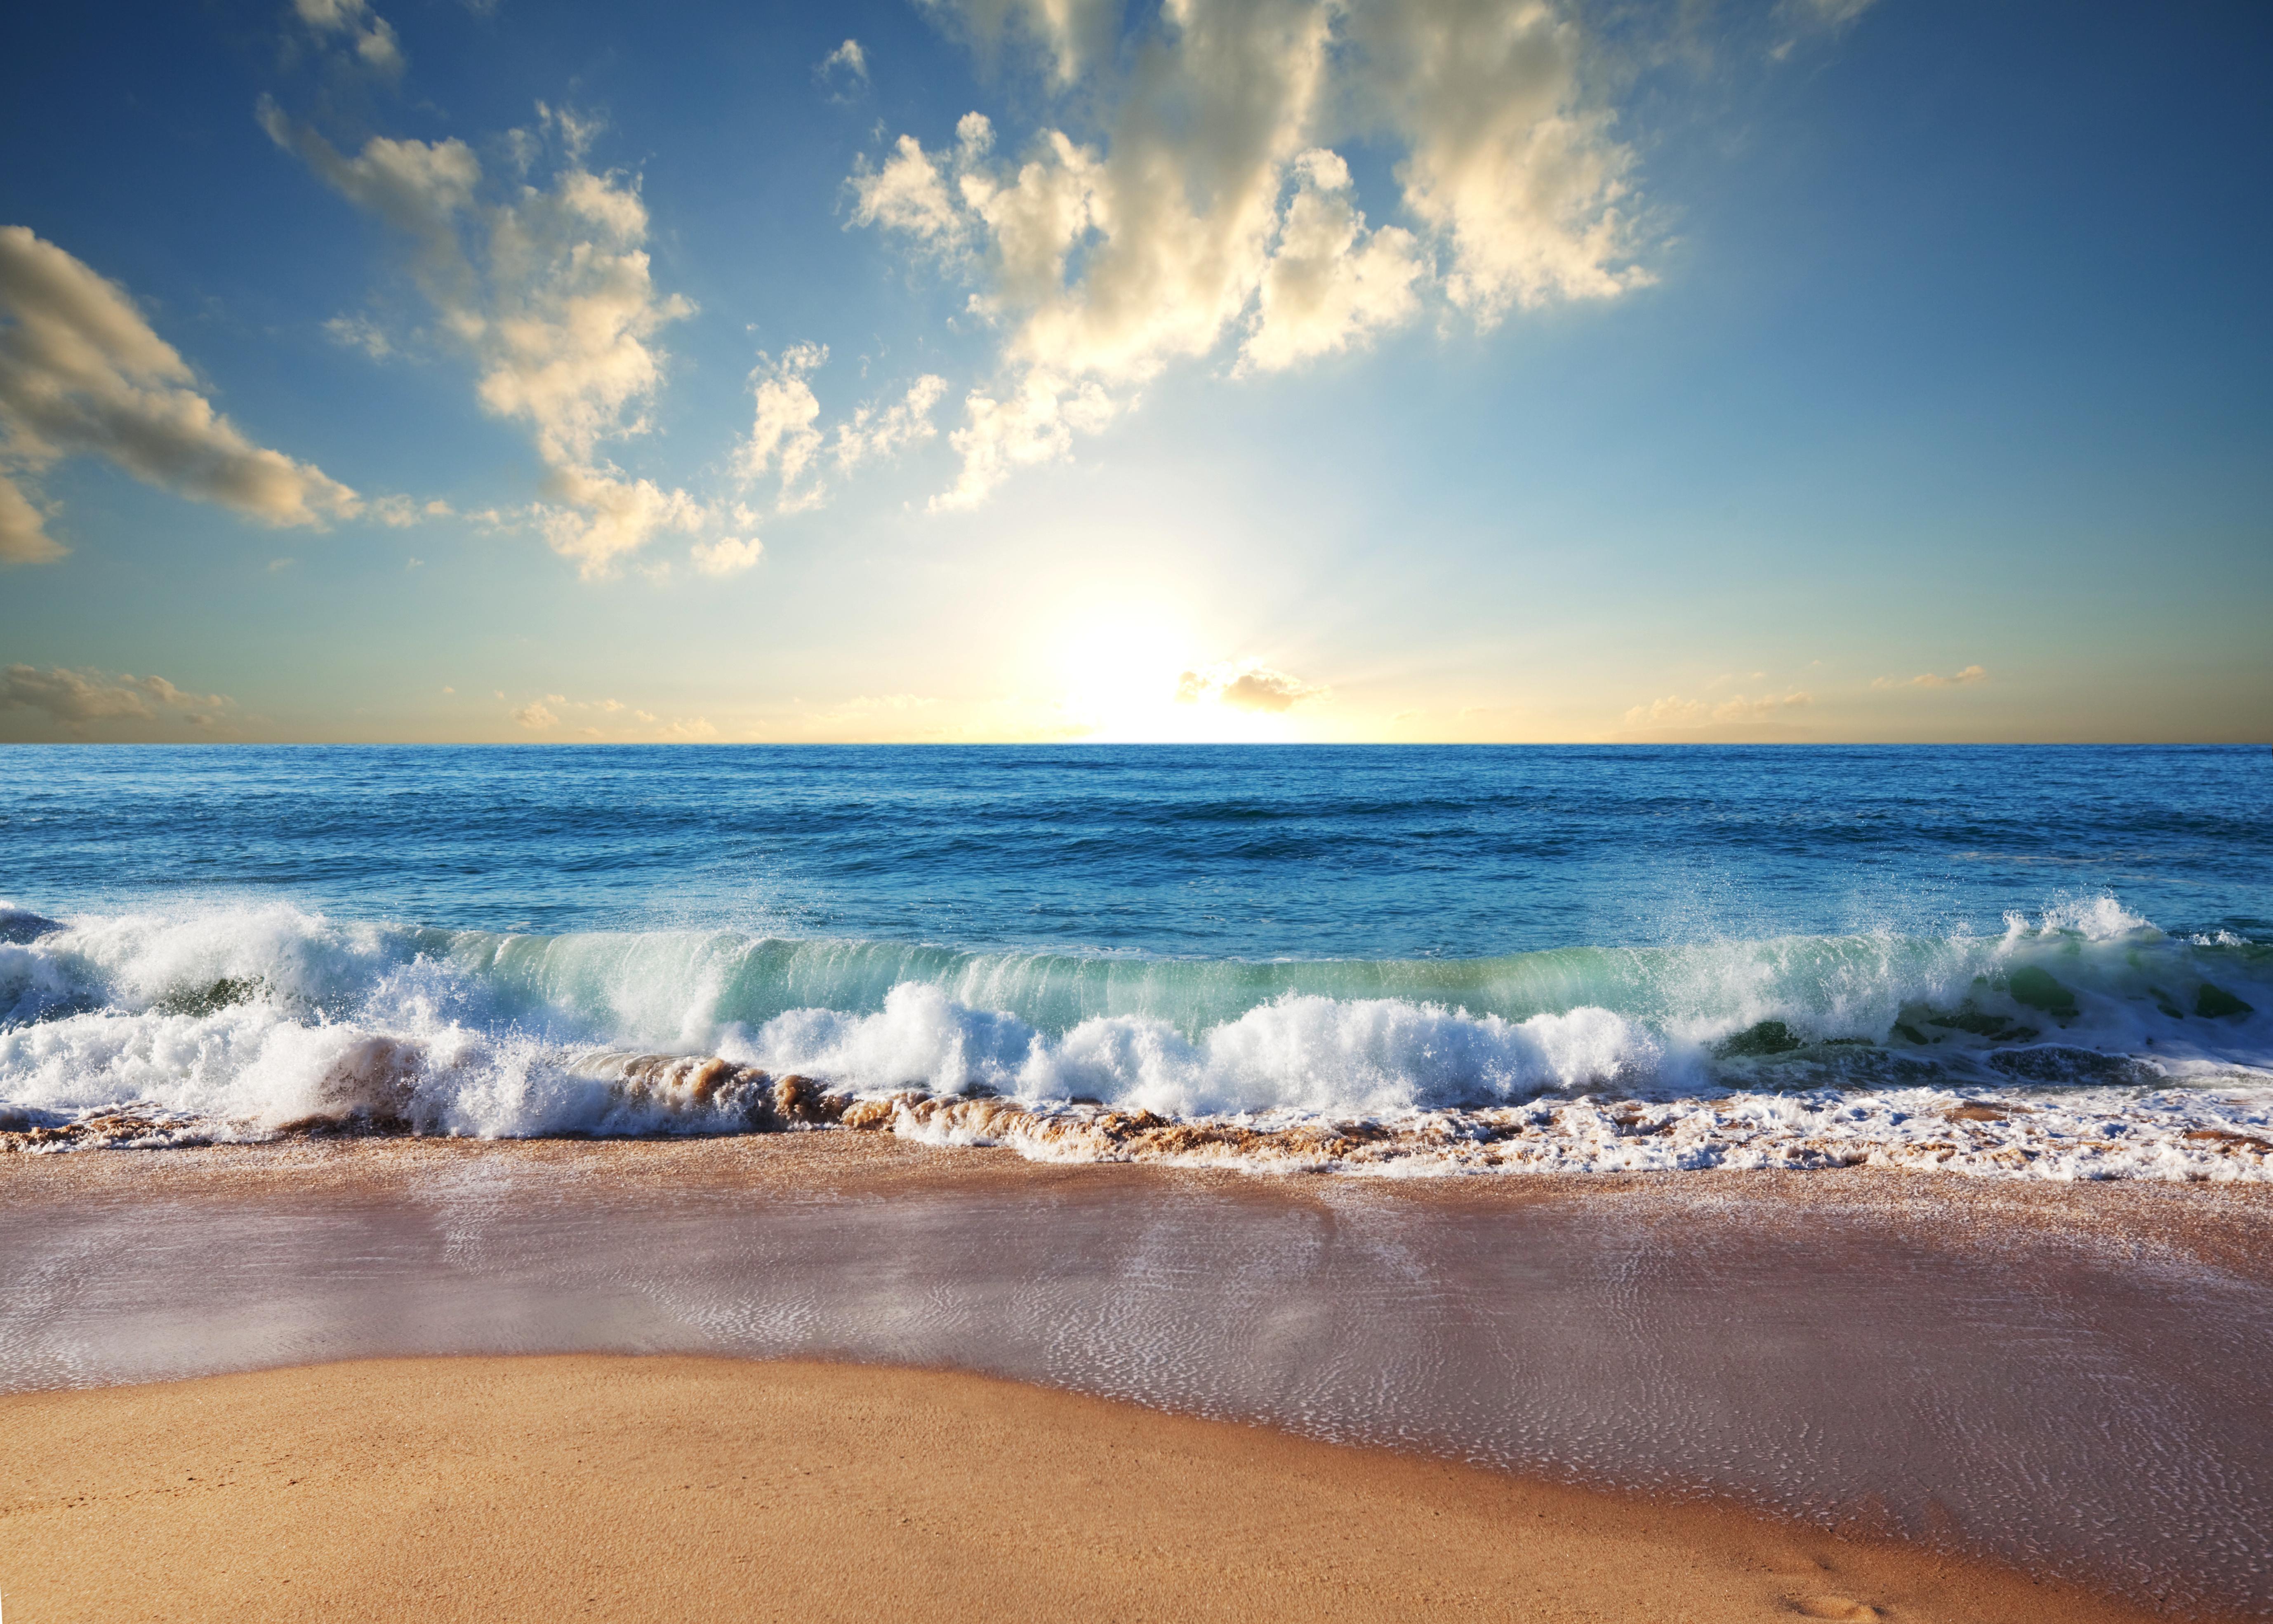 берег волны море  № 251124 бесплатно